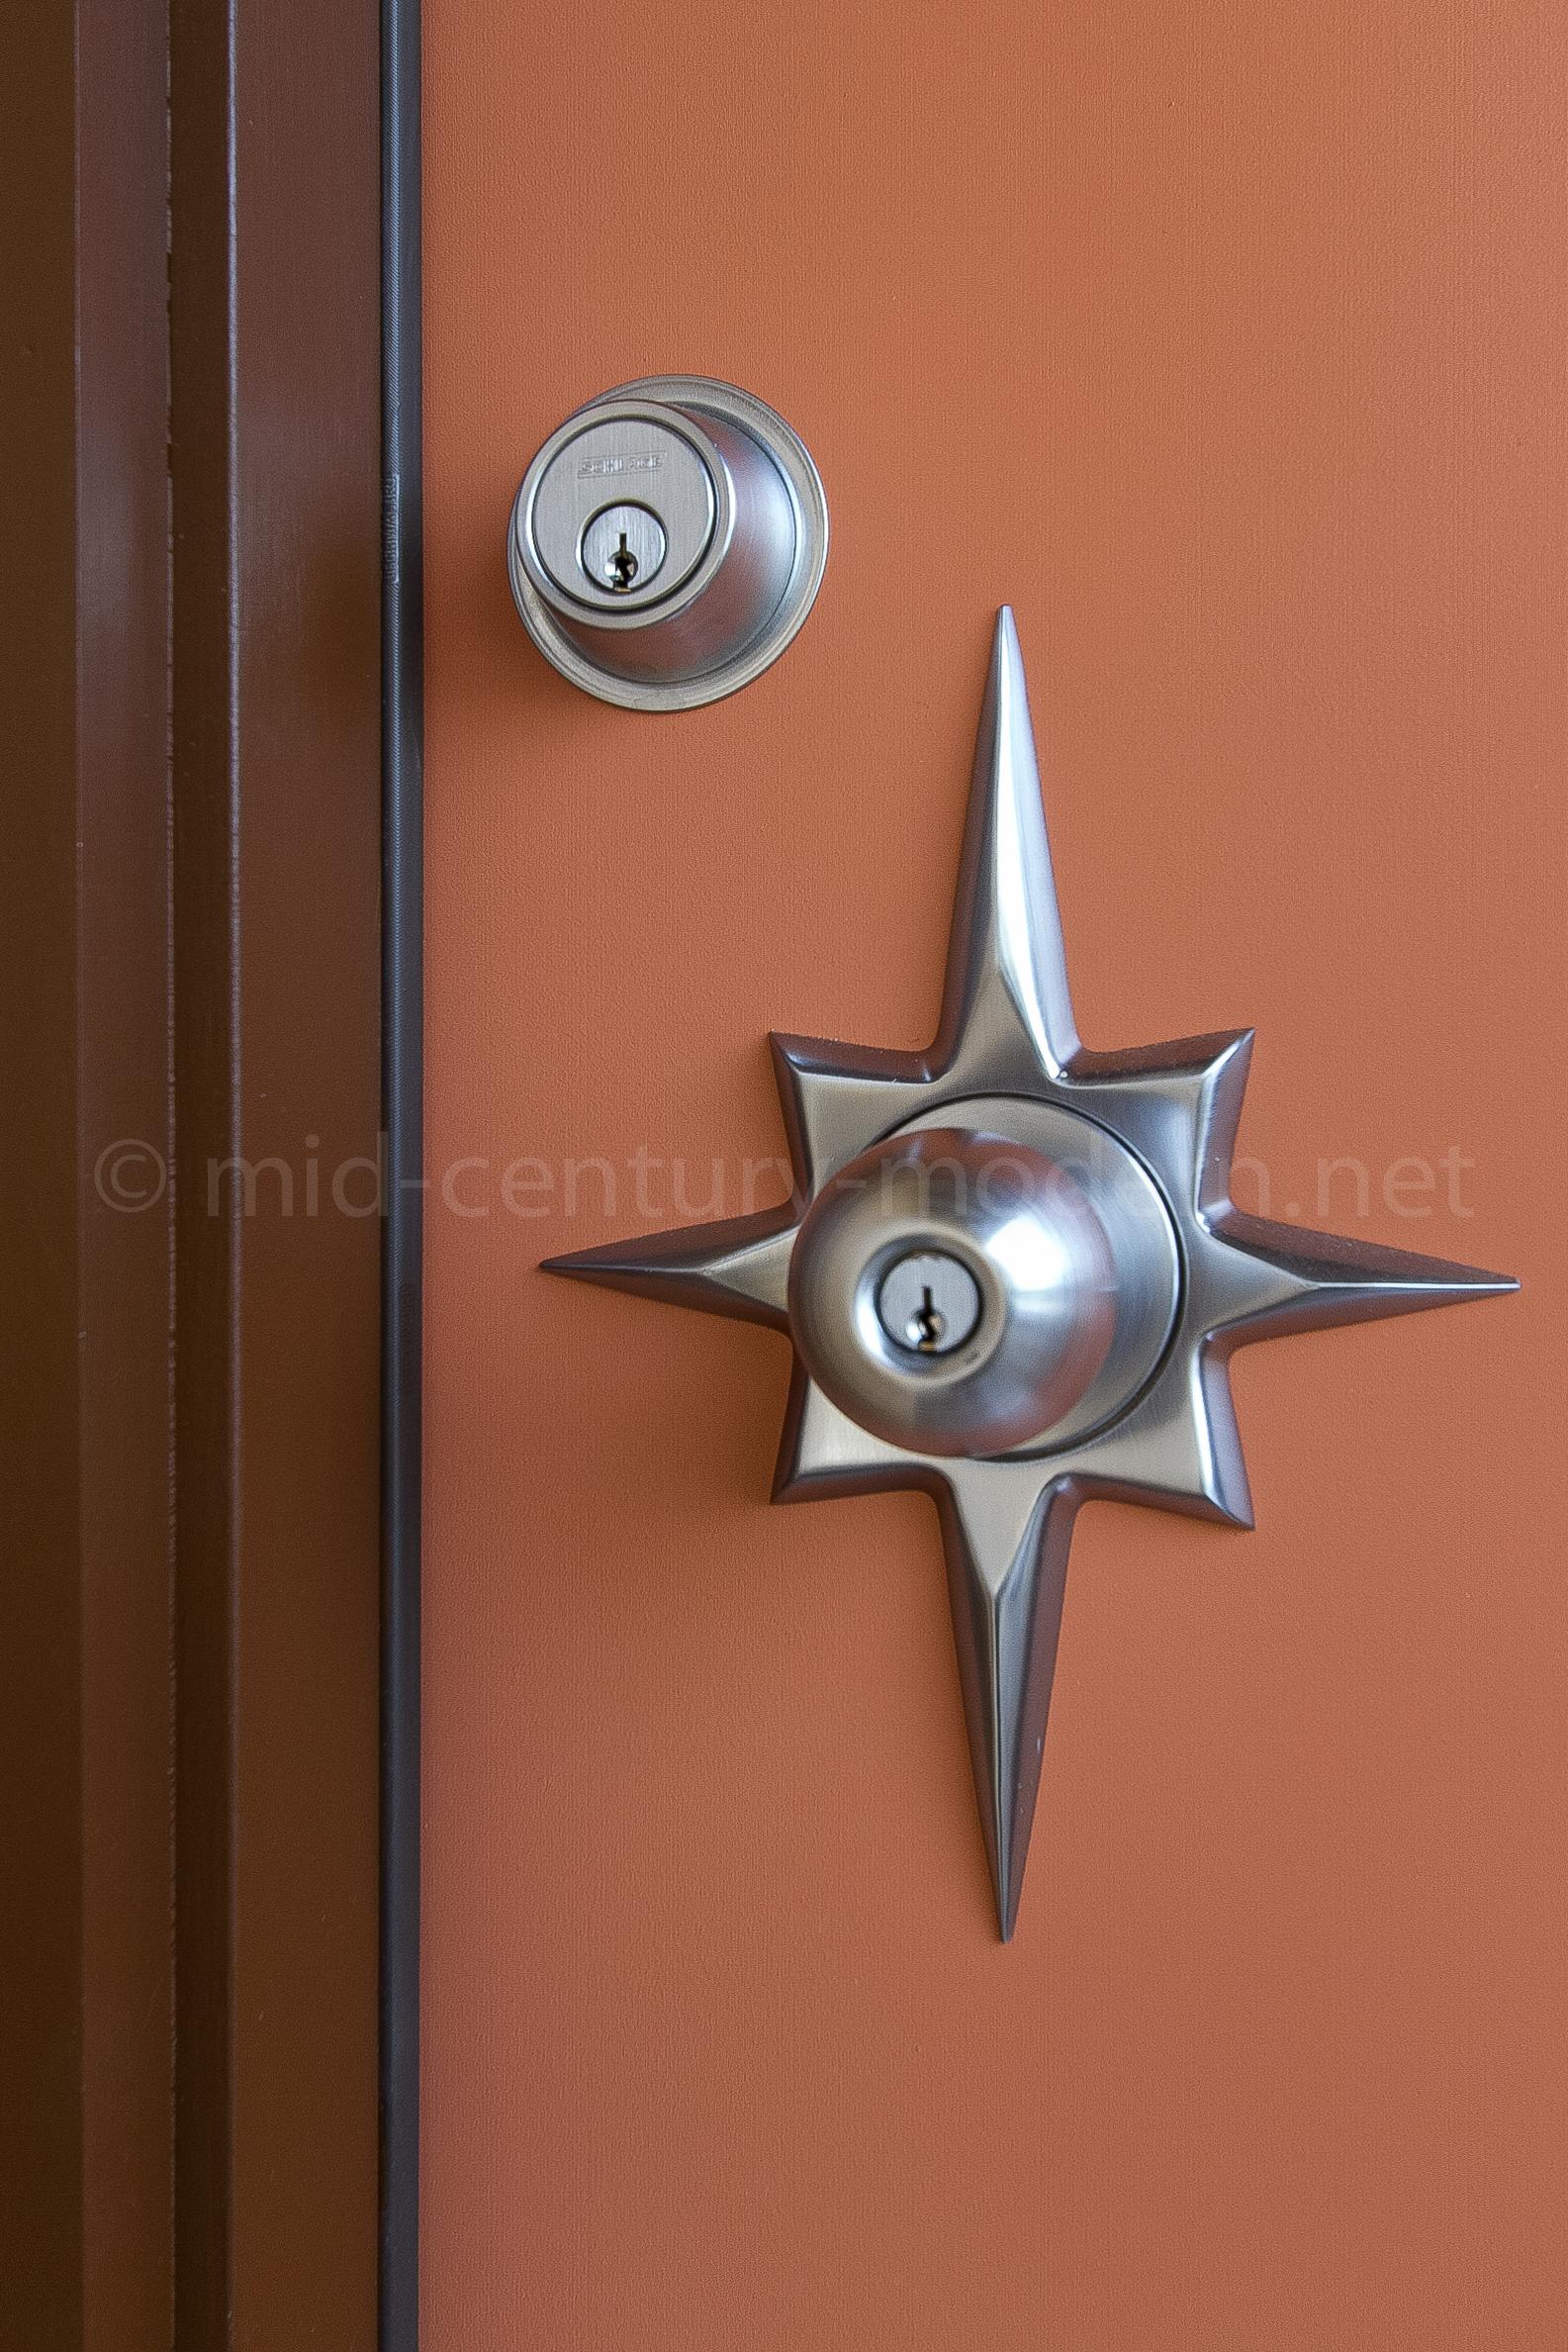 mid century door knobs photo - 4